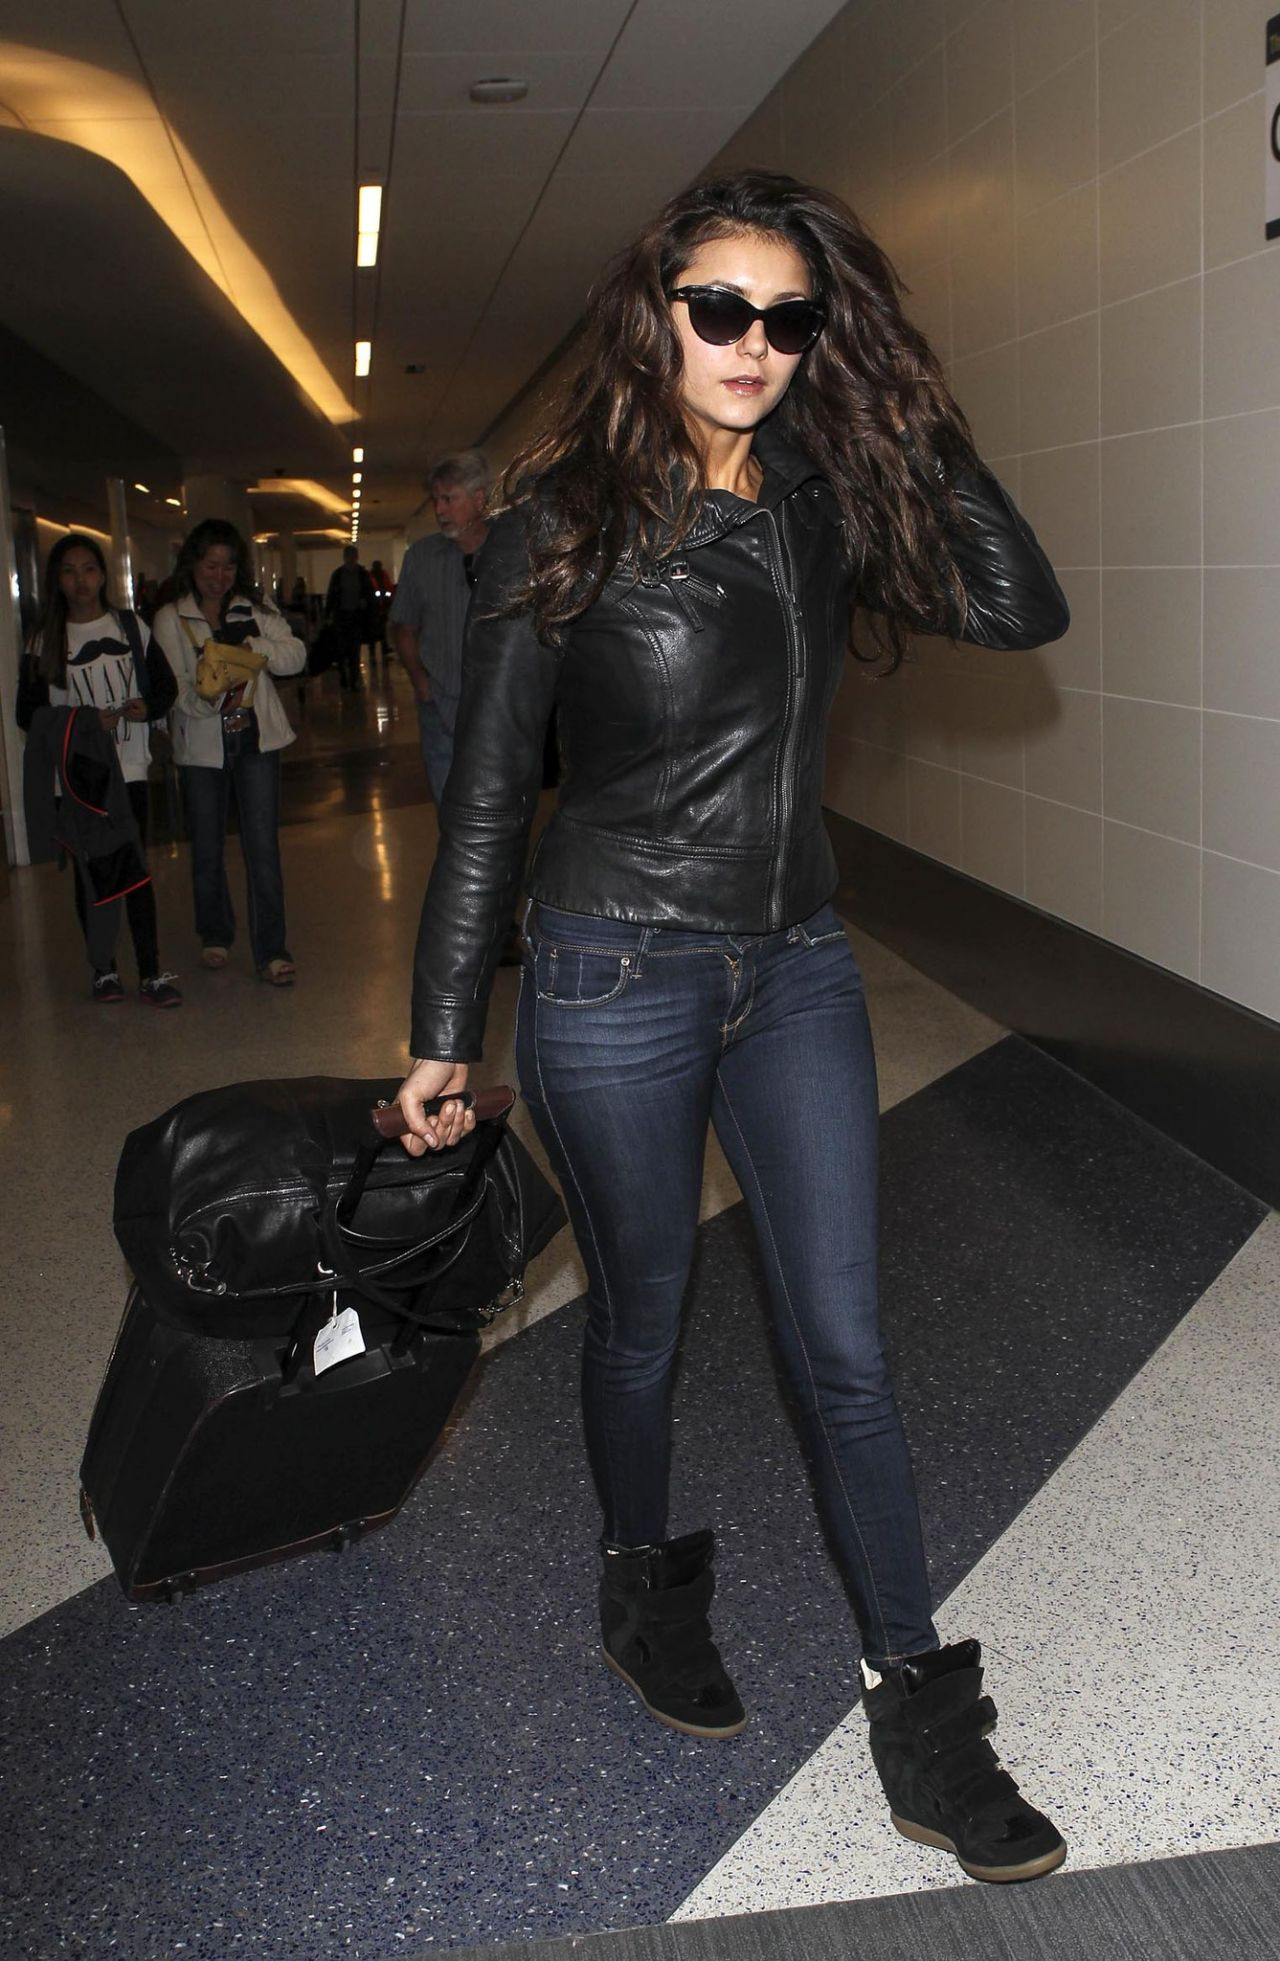 Nina Dobrev in Jeans at LAX Airport - March 2014 • CelebMafia